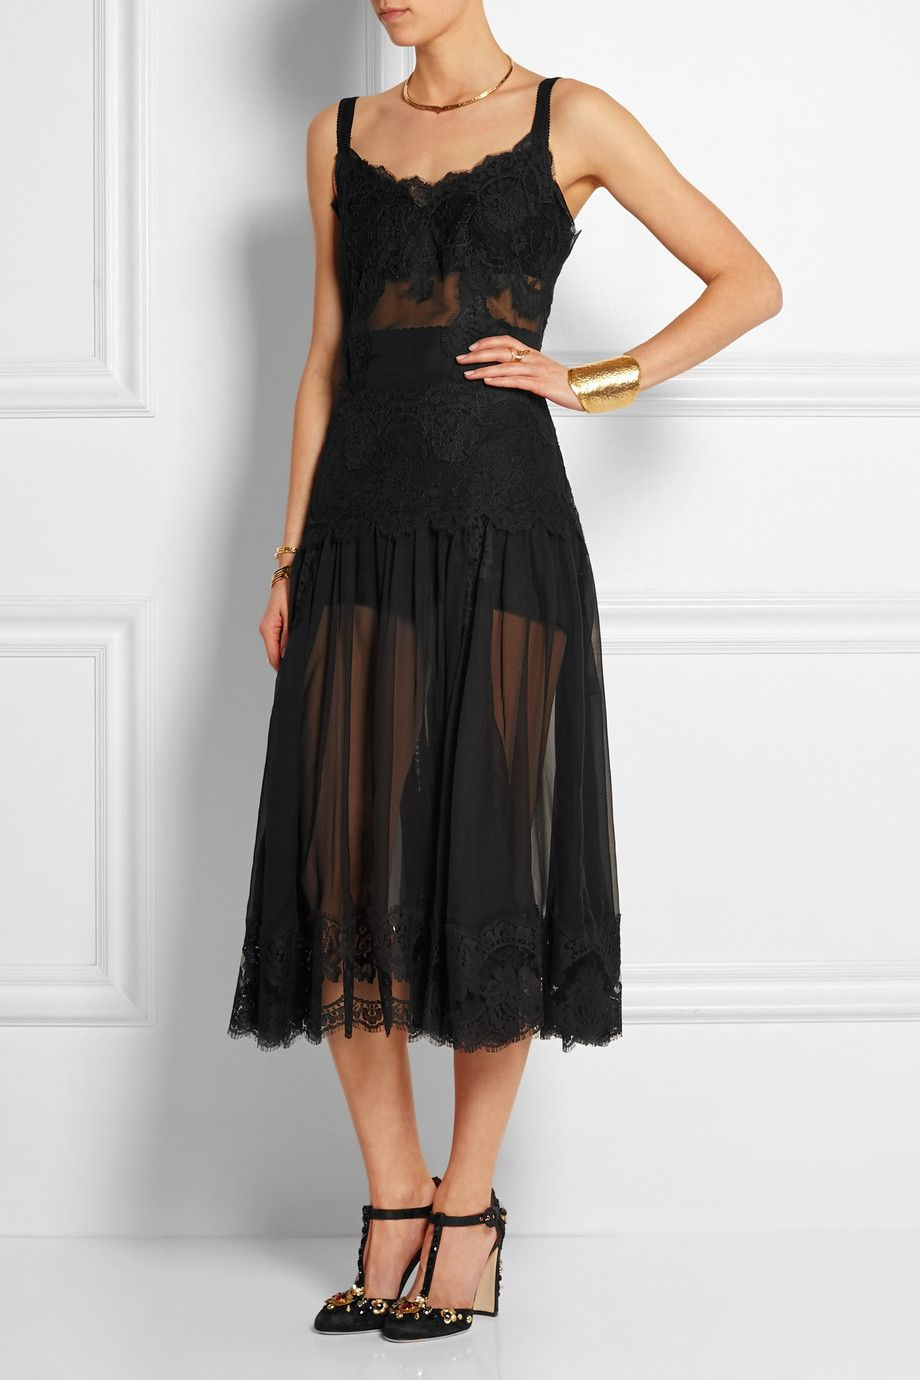 Dolce & Gabbana|Lace and silk-blend chiffon midi dress|NET-A-PORTER.COM